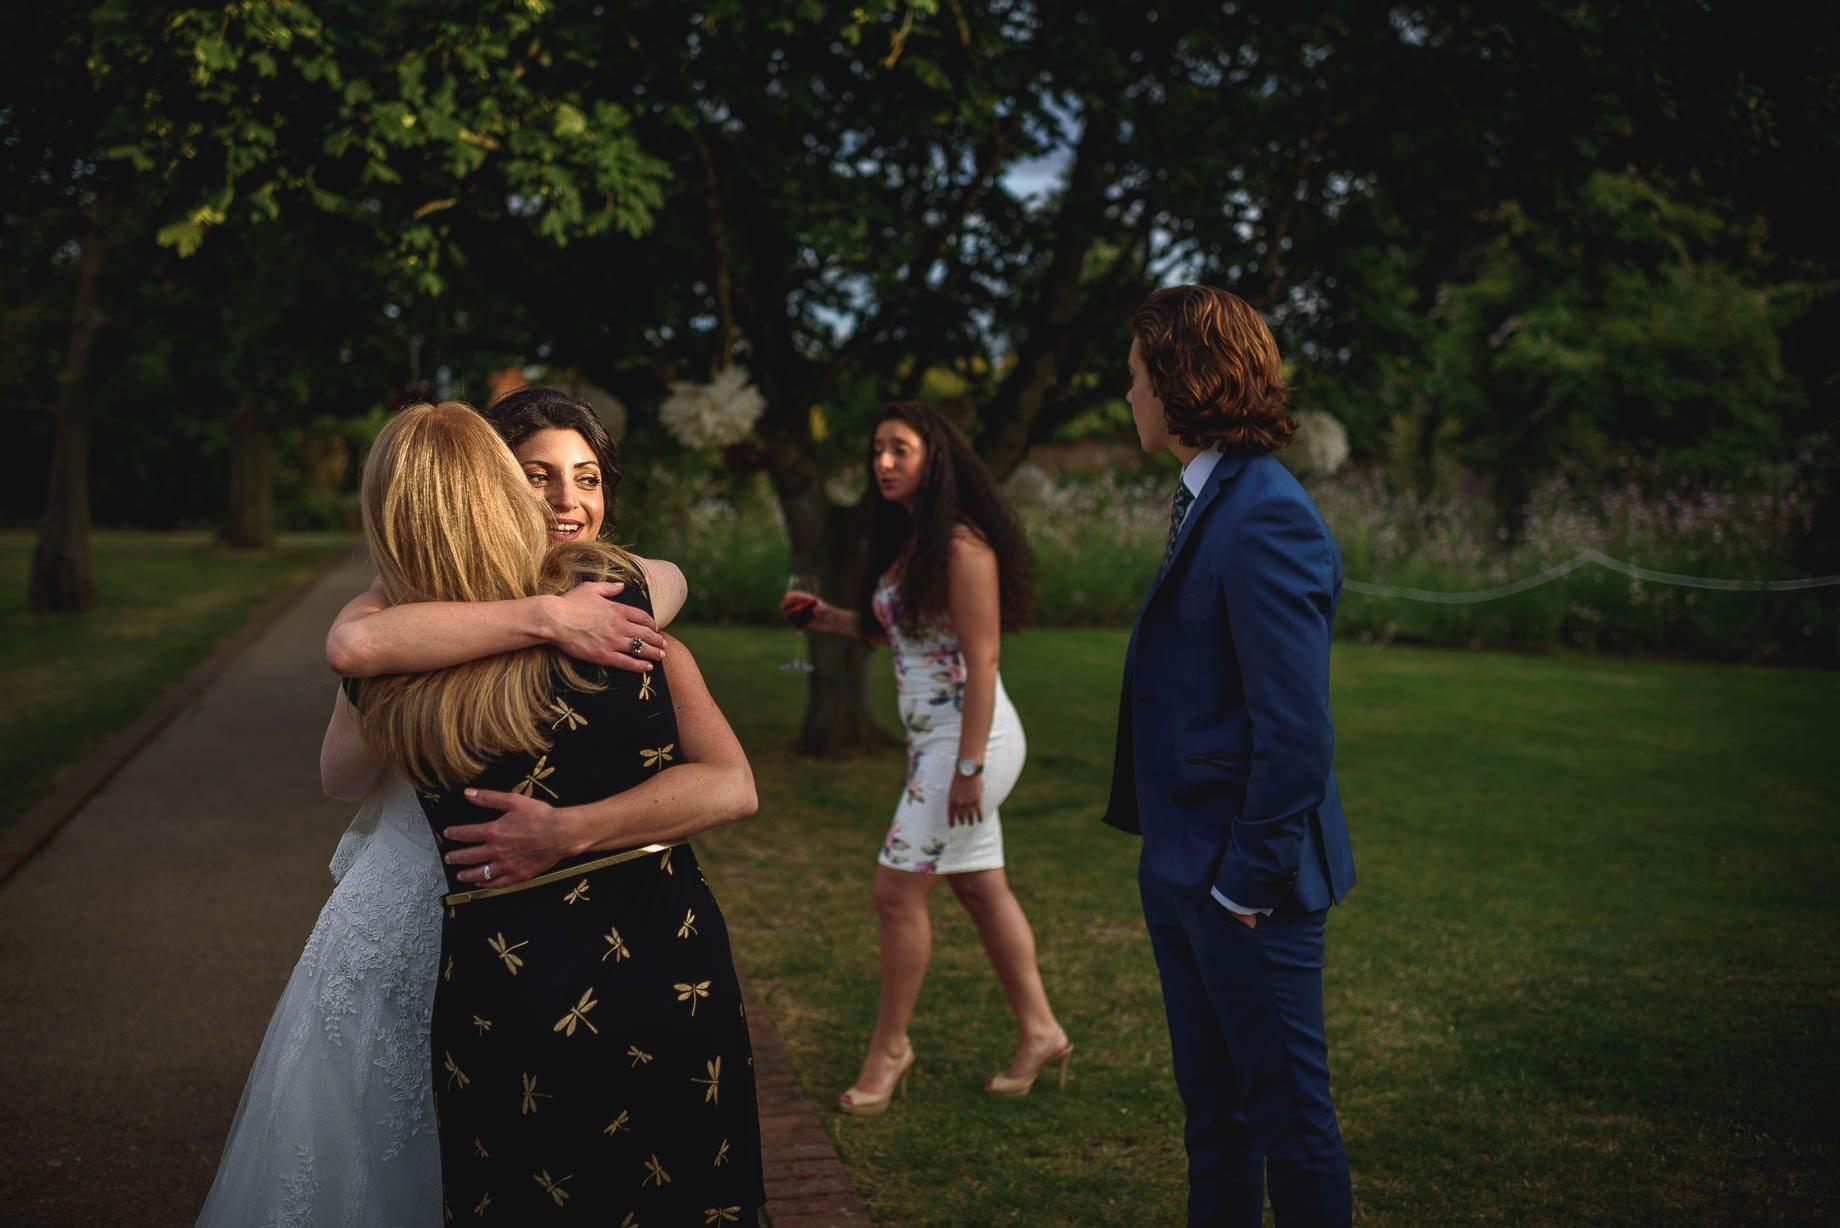 Gaynes Park wedding photography - Guy Collier Photography - Rachel and Jon (155 of 169)